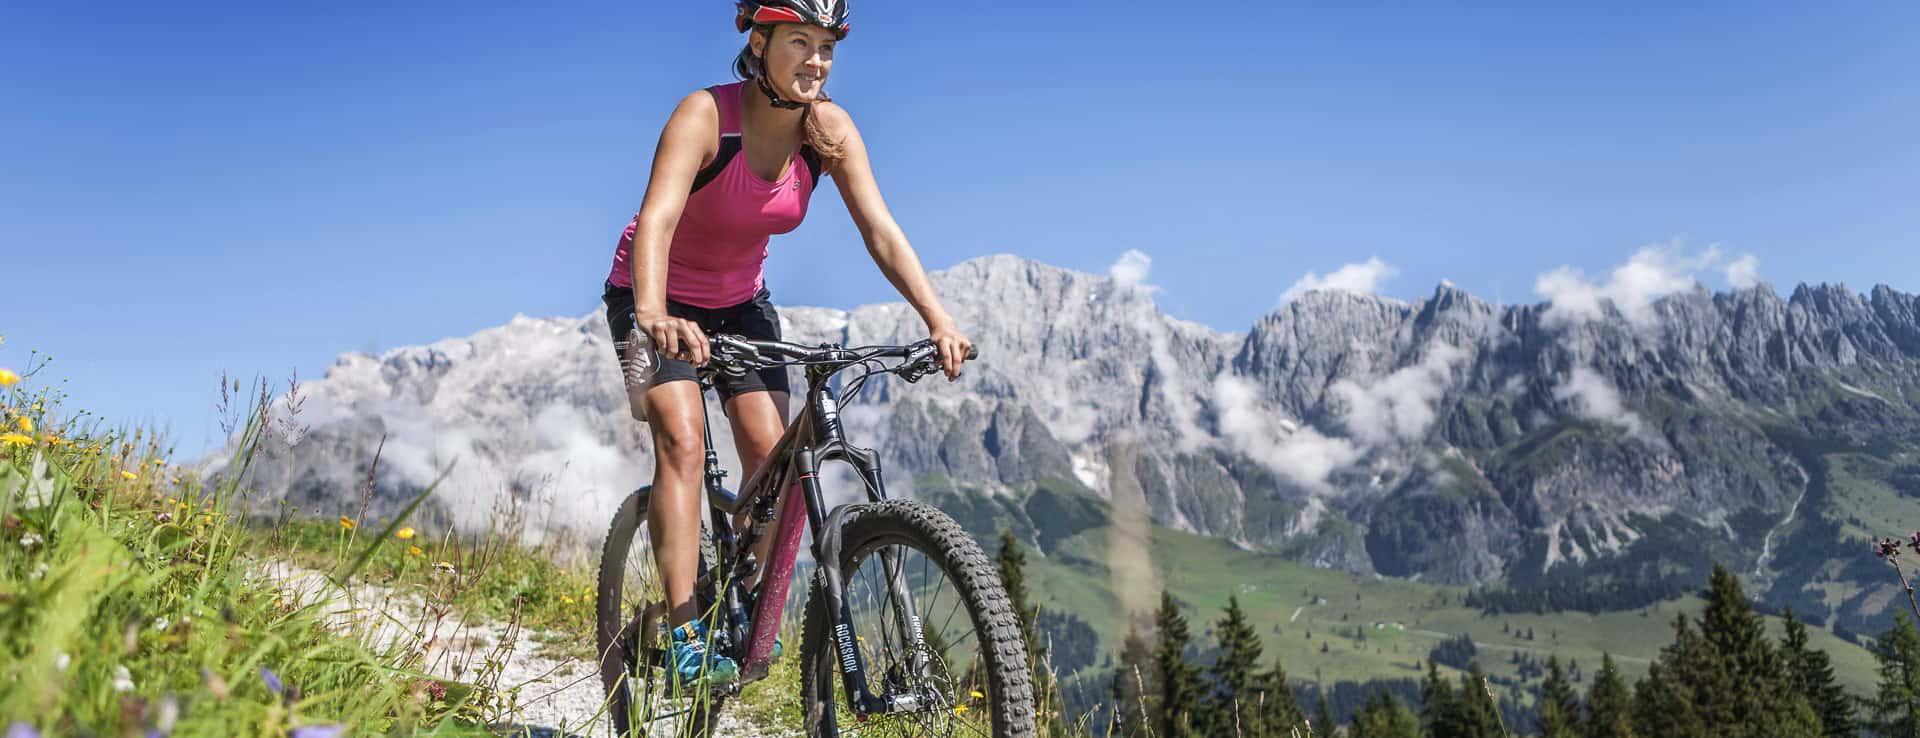 Cykelresa MTB egen hand